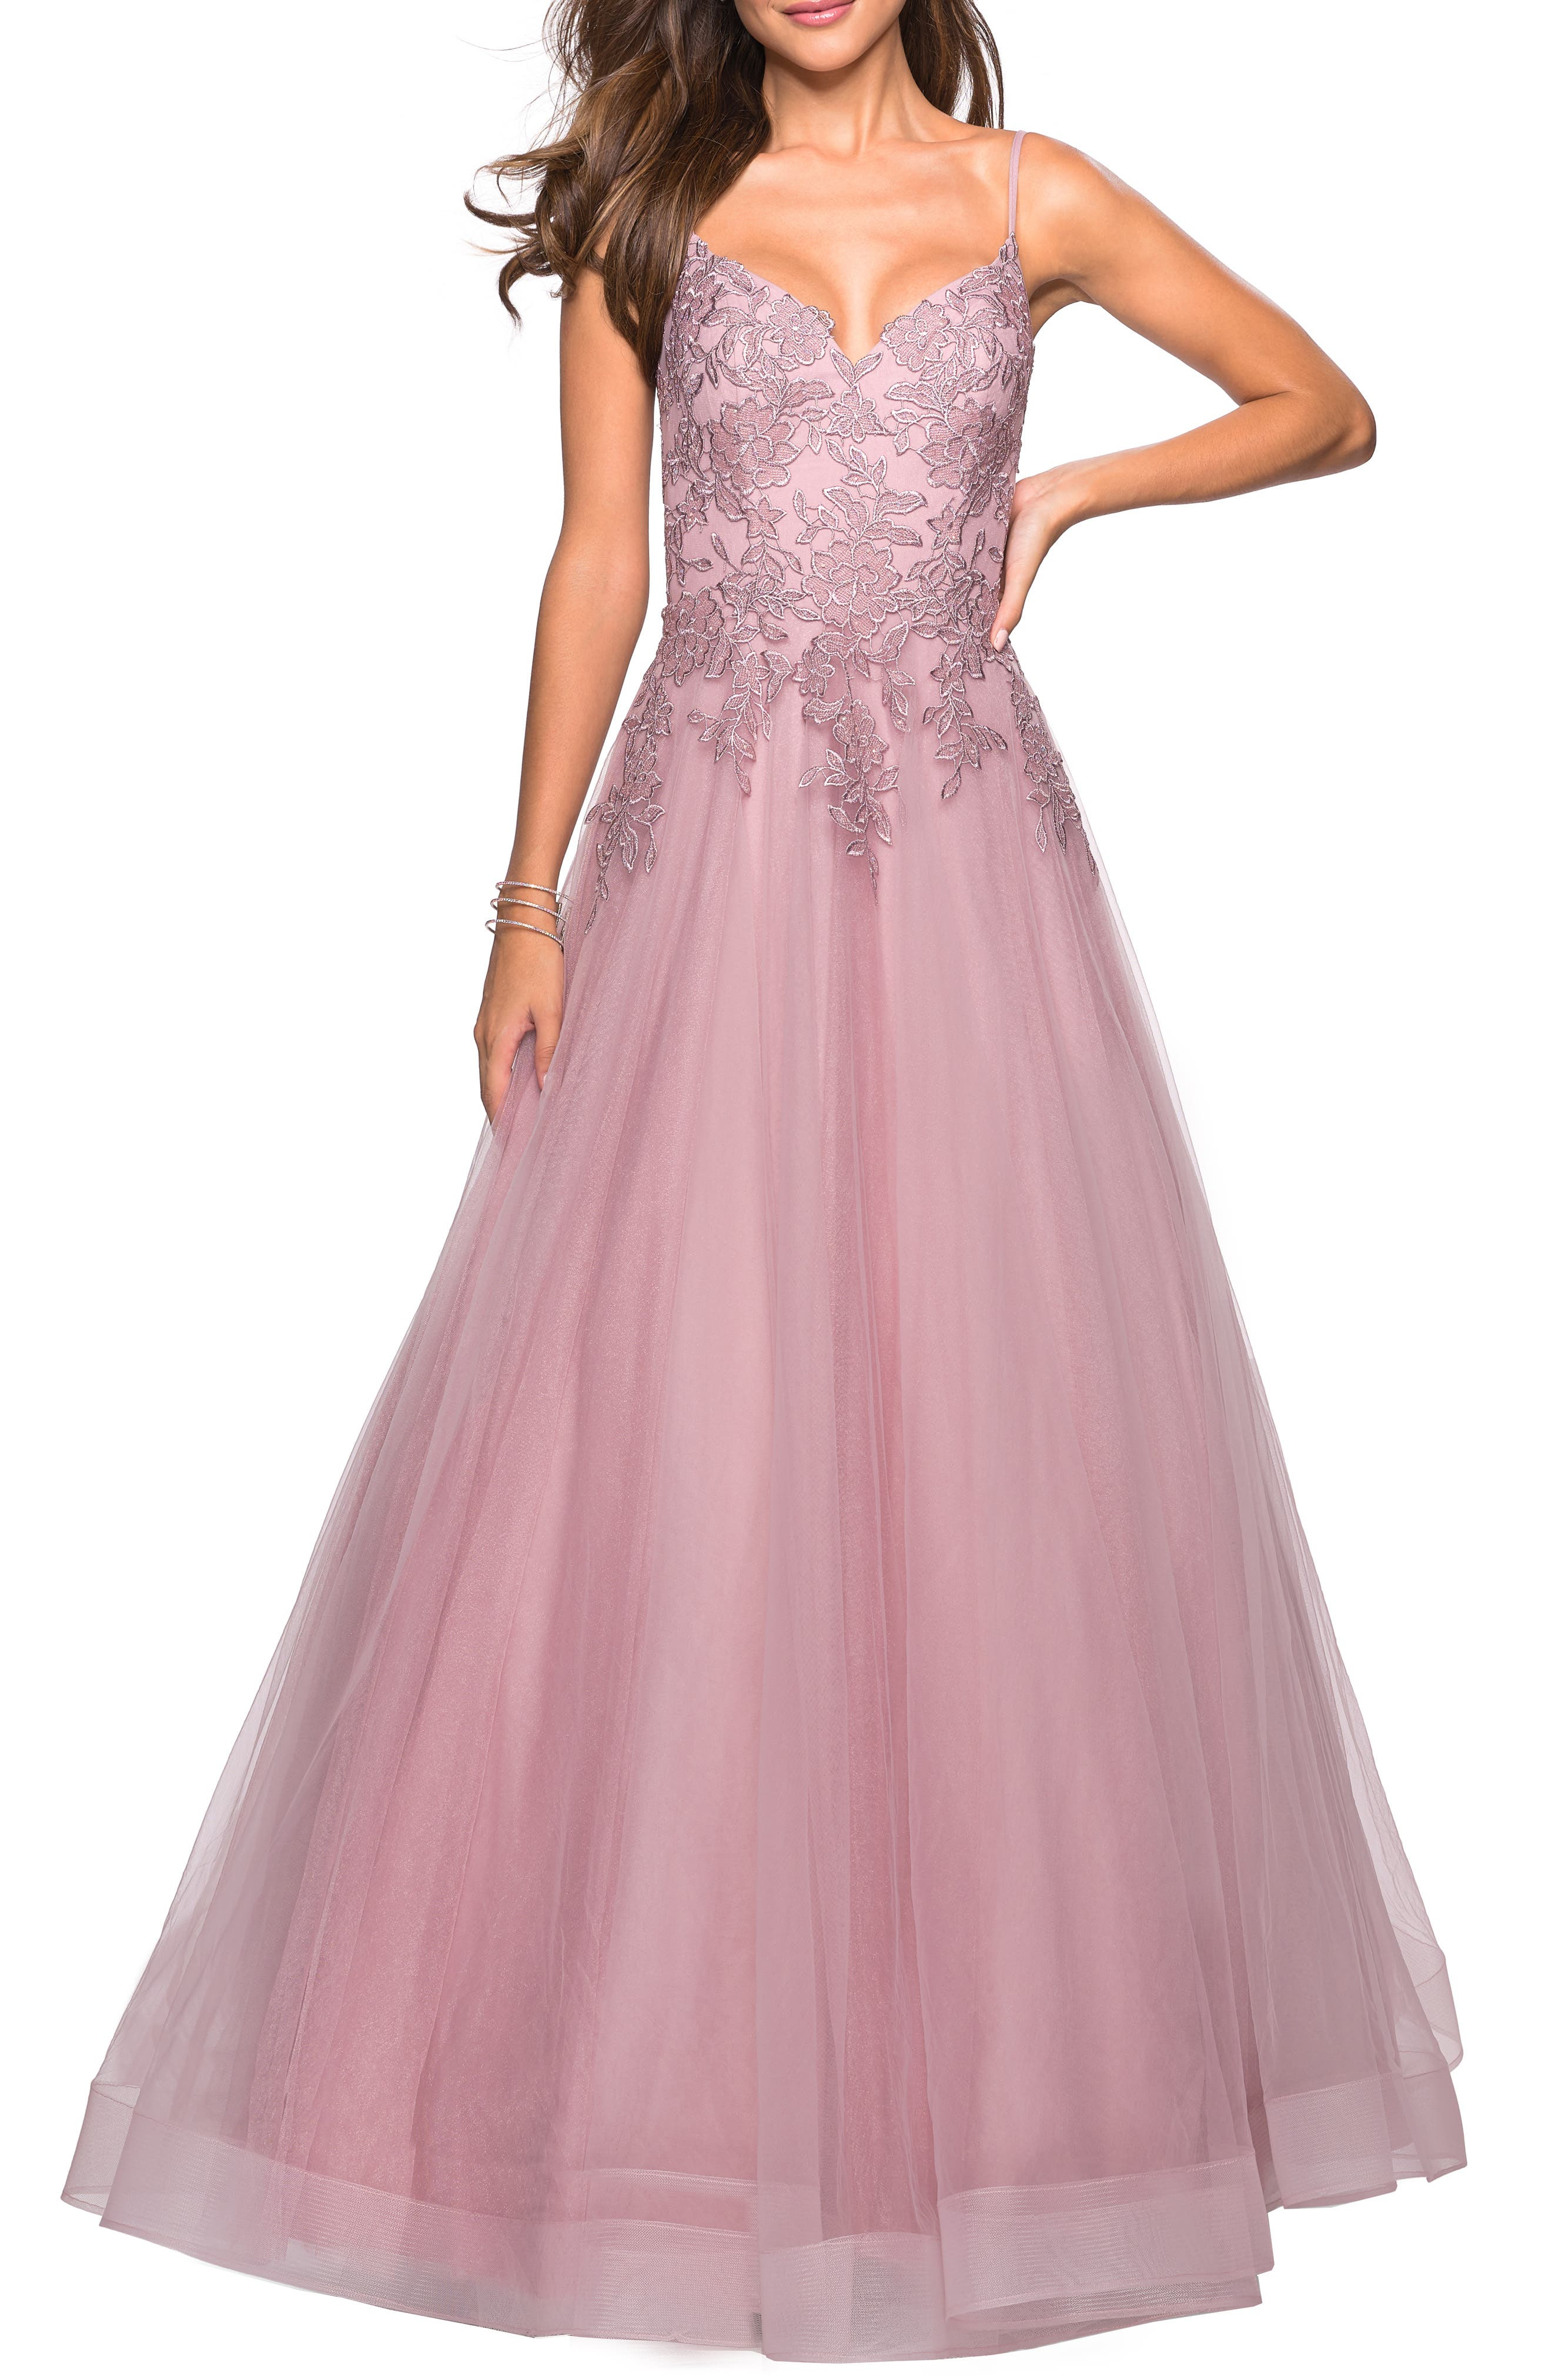 LA FEMME,                             Lace & Tulle Flared Skirt Evening Dress,                             Main thumbnail 1, color,                             MAUVE